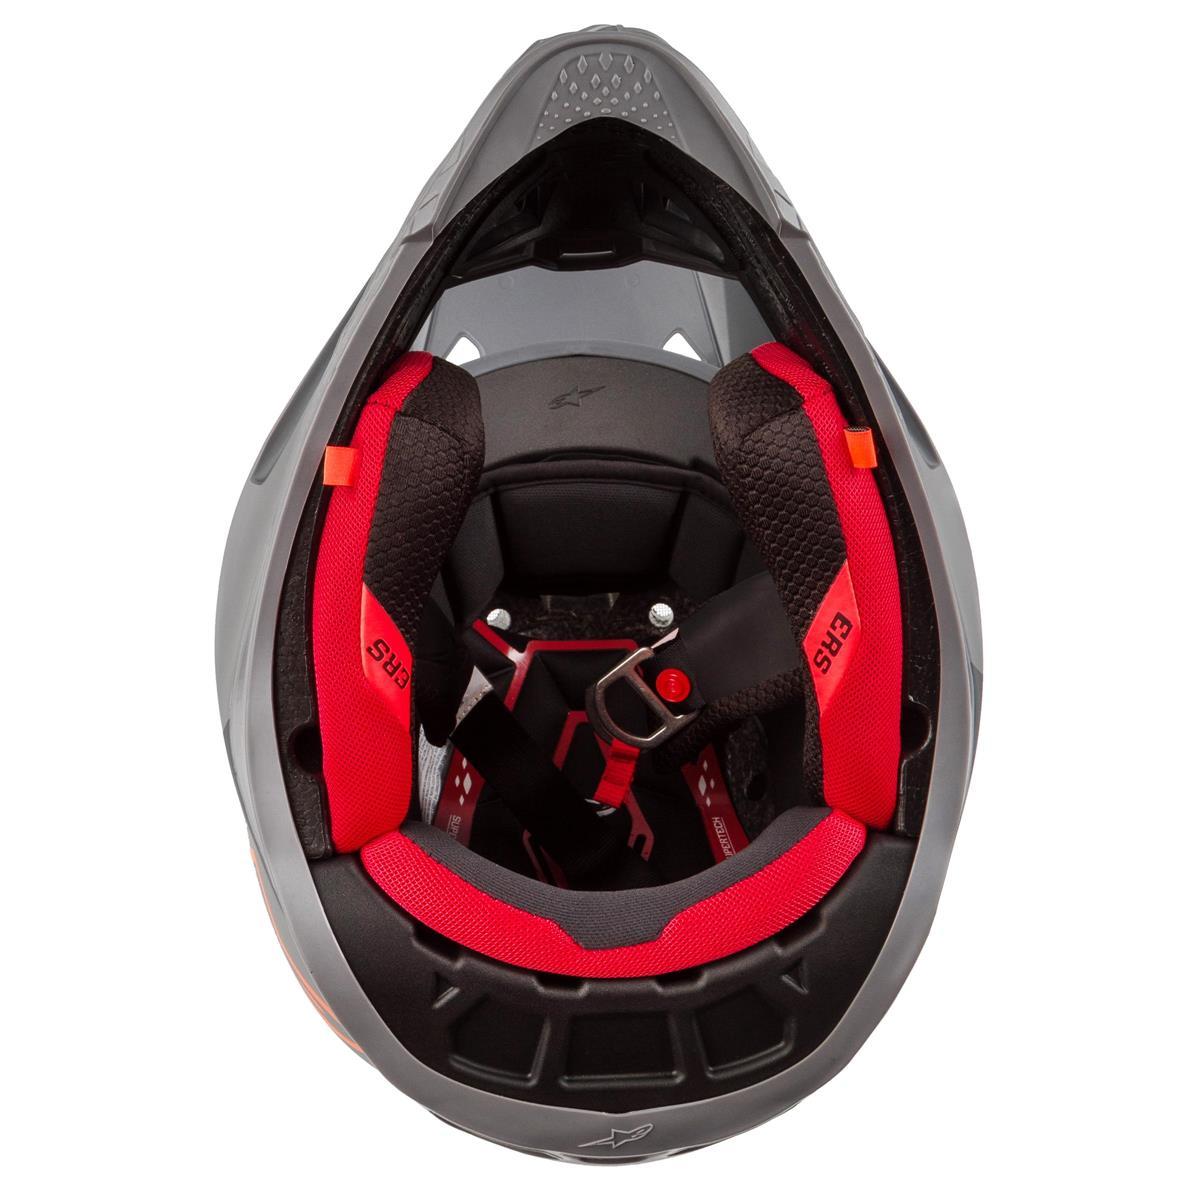 alpinestars-helm-helmet-supertech-s-m10-7